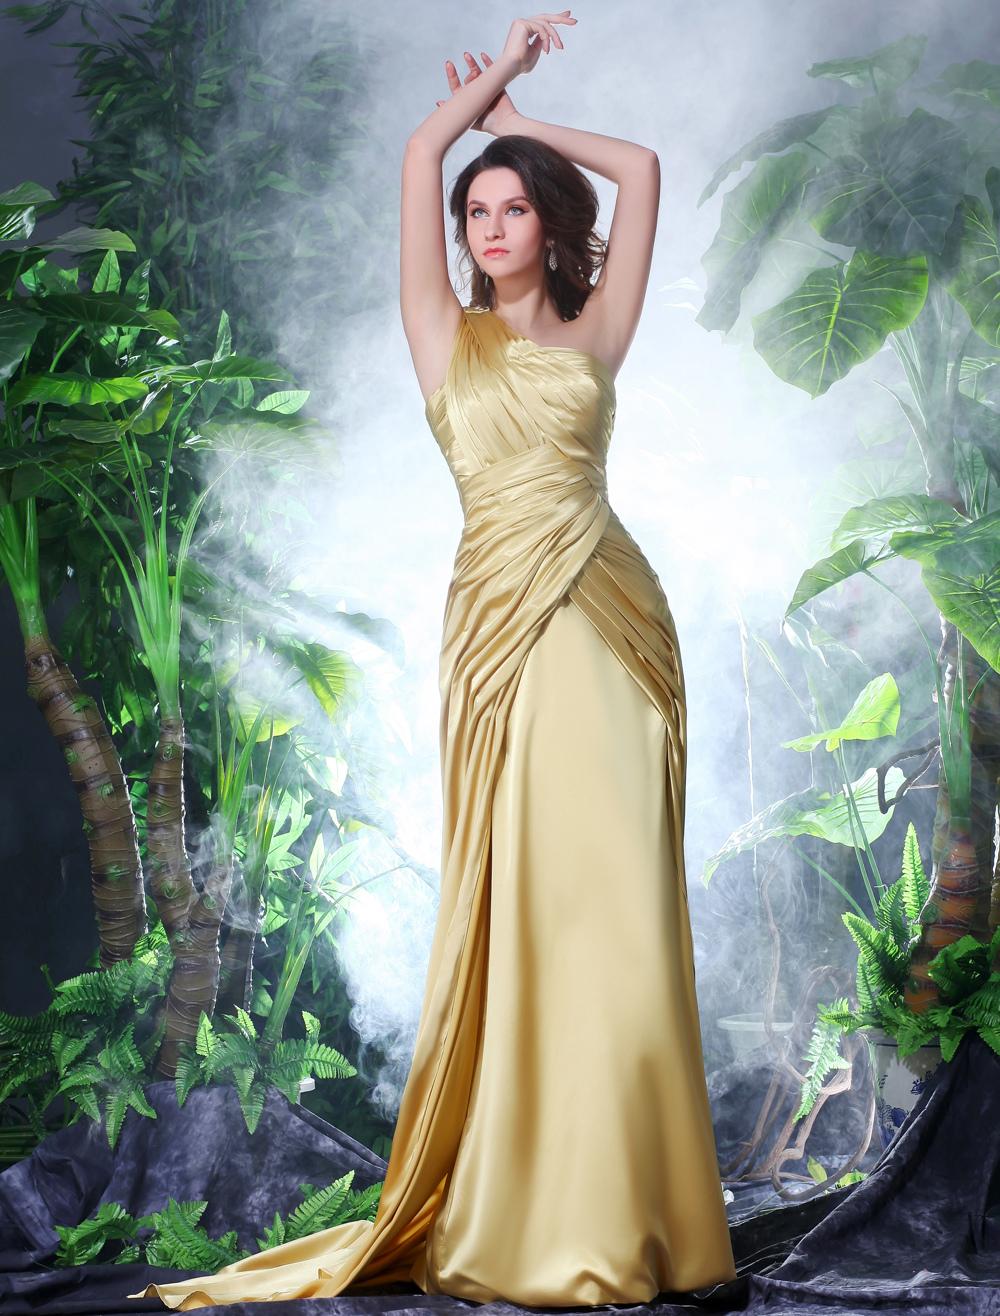 Gold One-Shoulder Sleeveless Pleated Sheath Prom Dress Milanoo